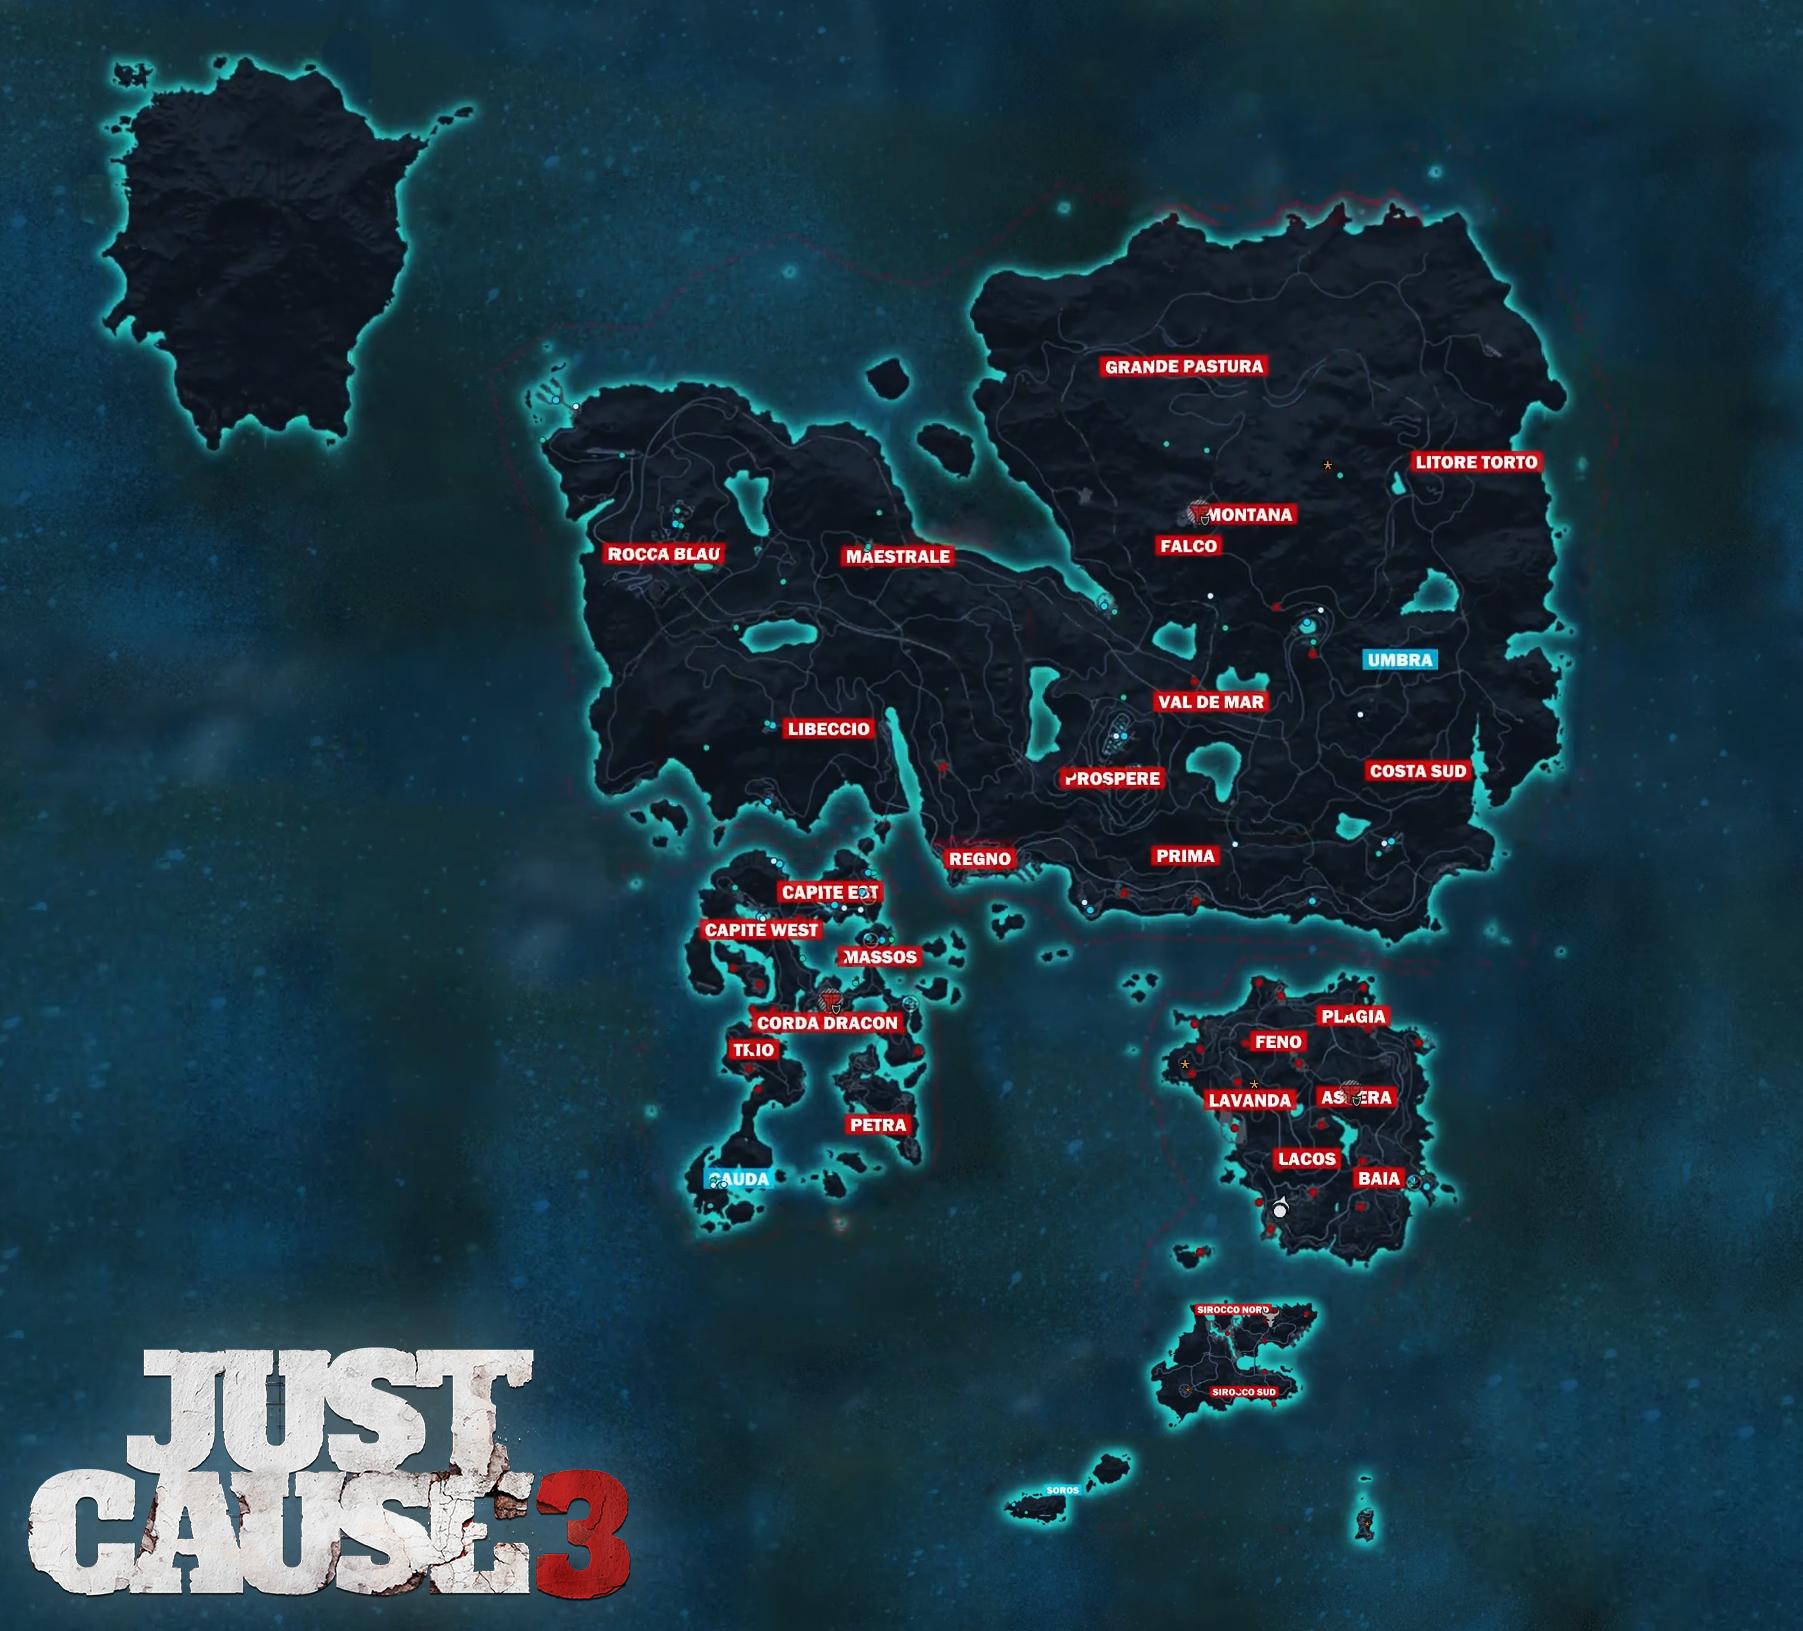 Medici area names map 2 Maps